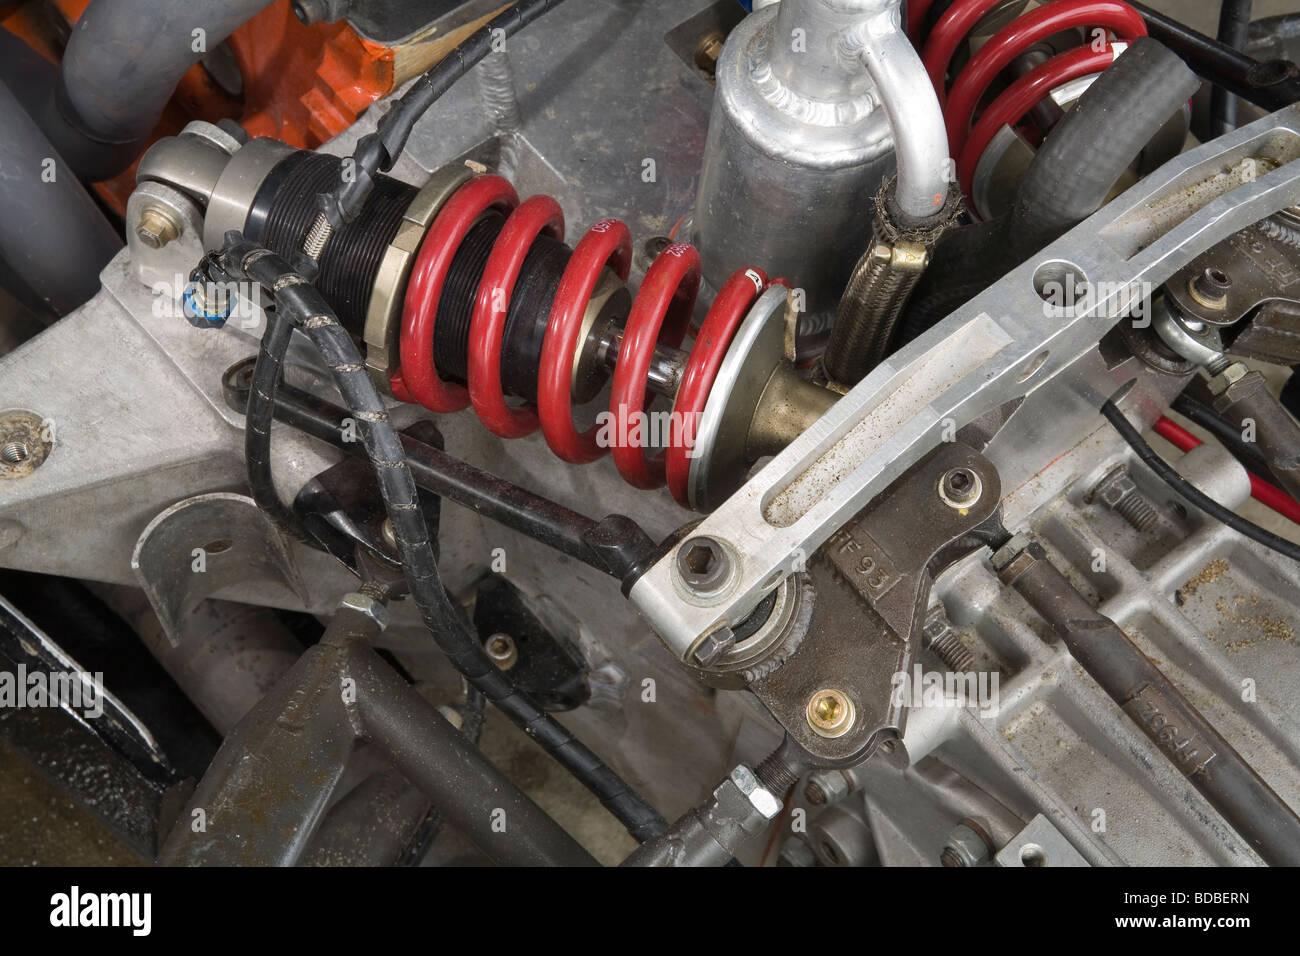 Shock absorber setup on an open wheeler race car Stock Photo